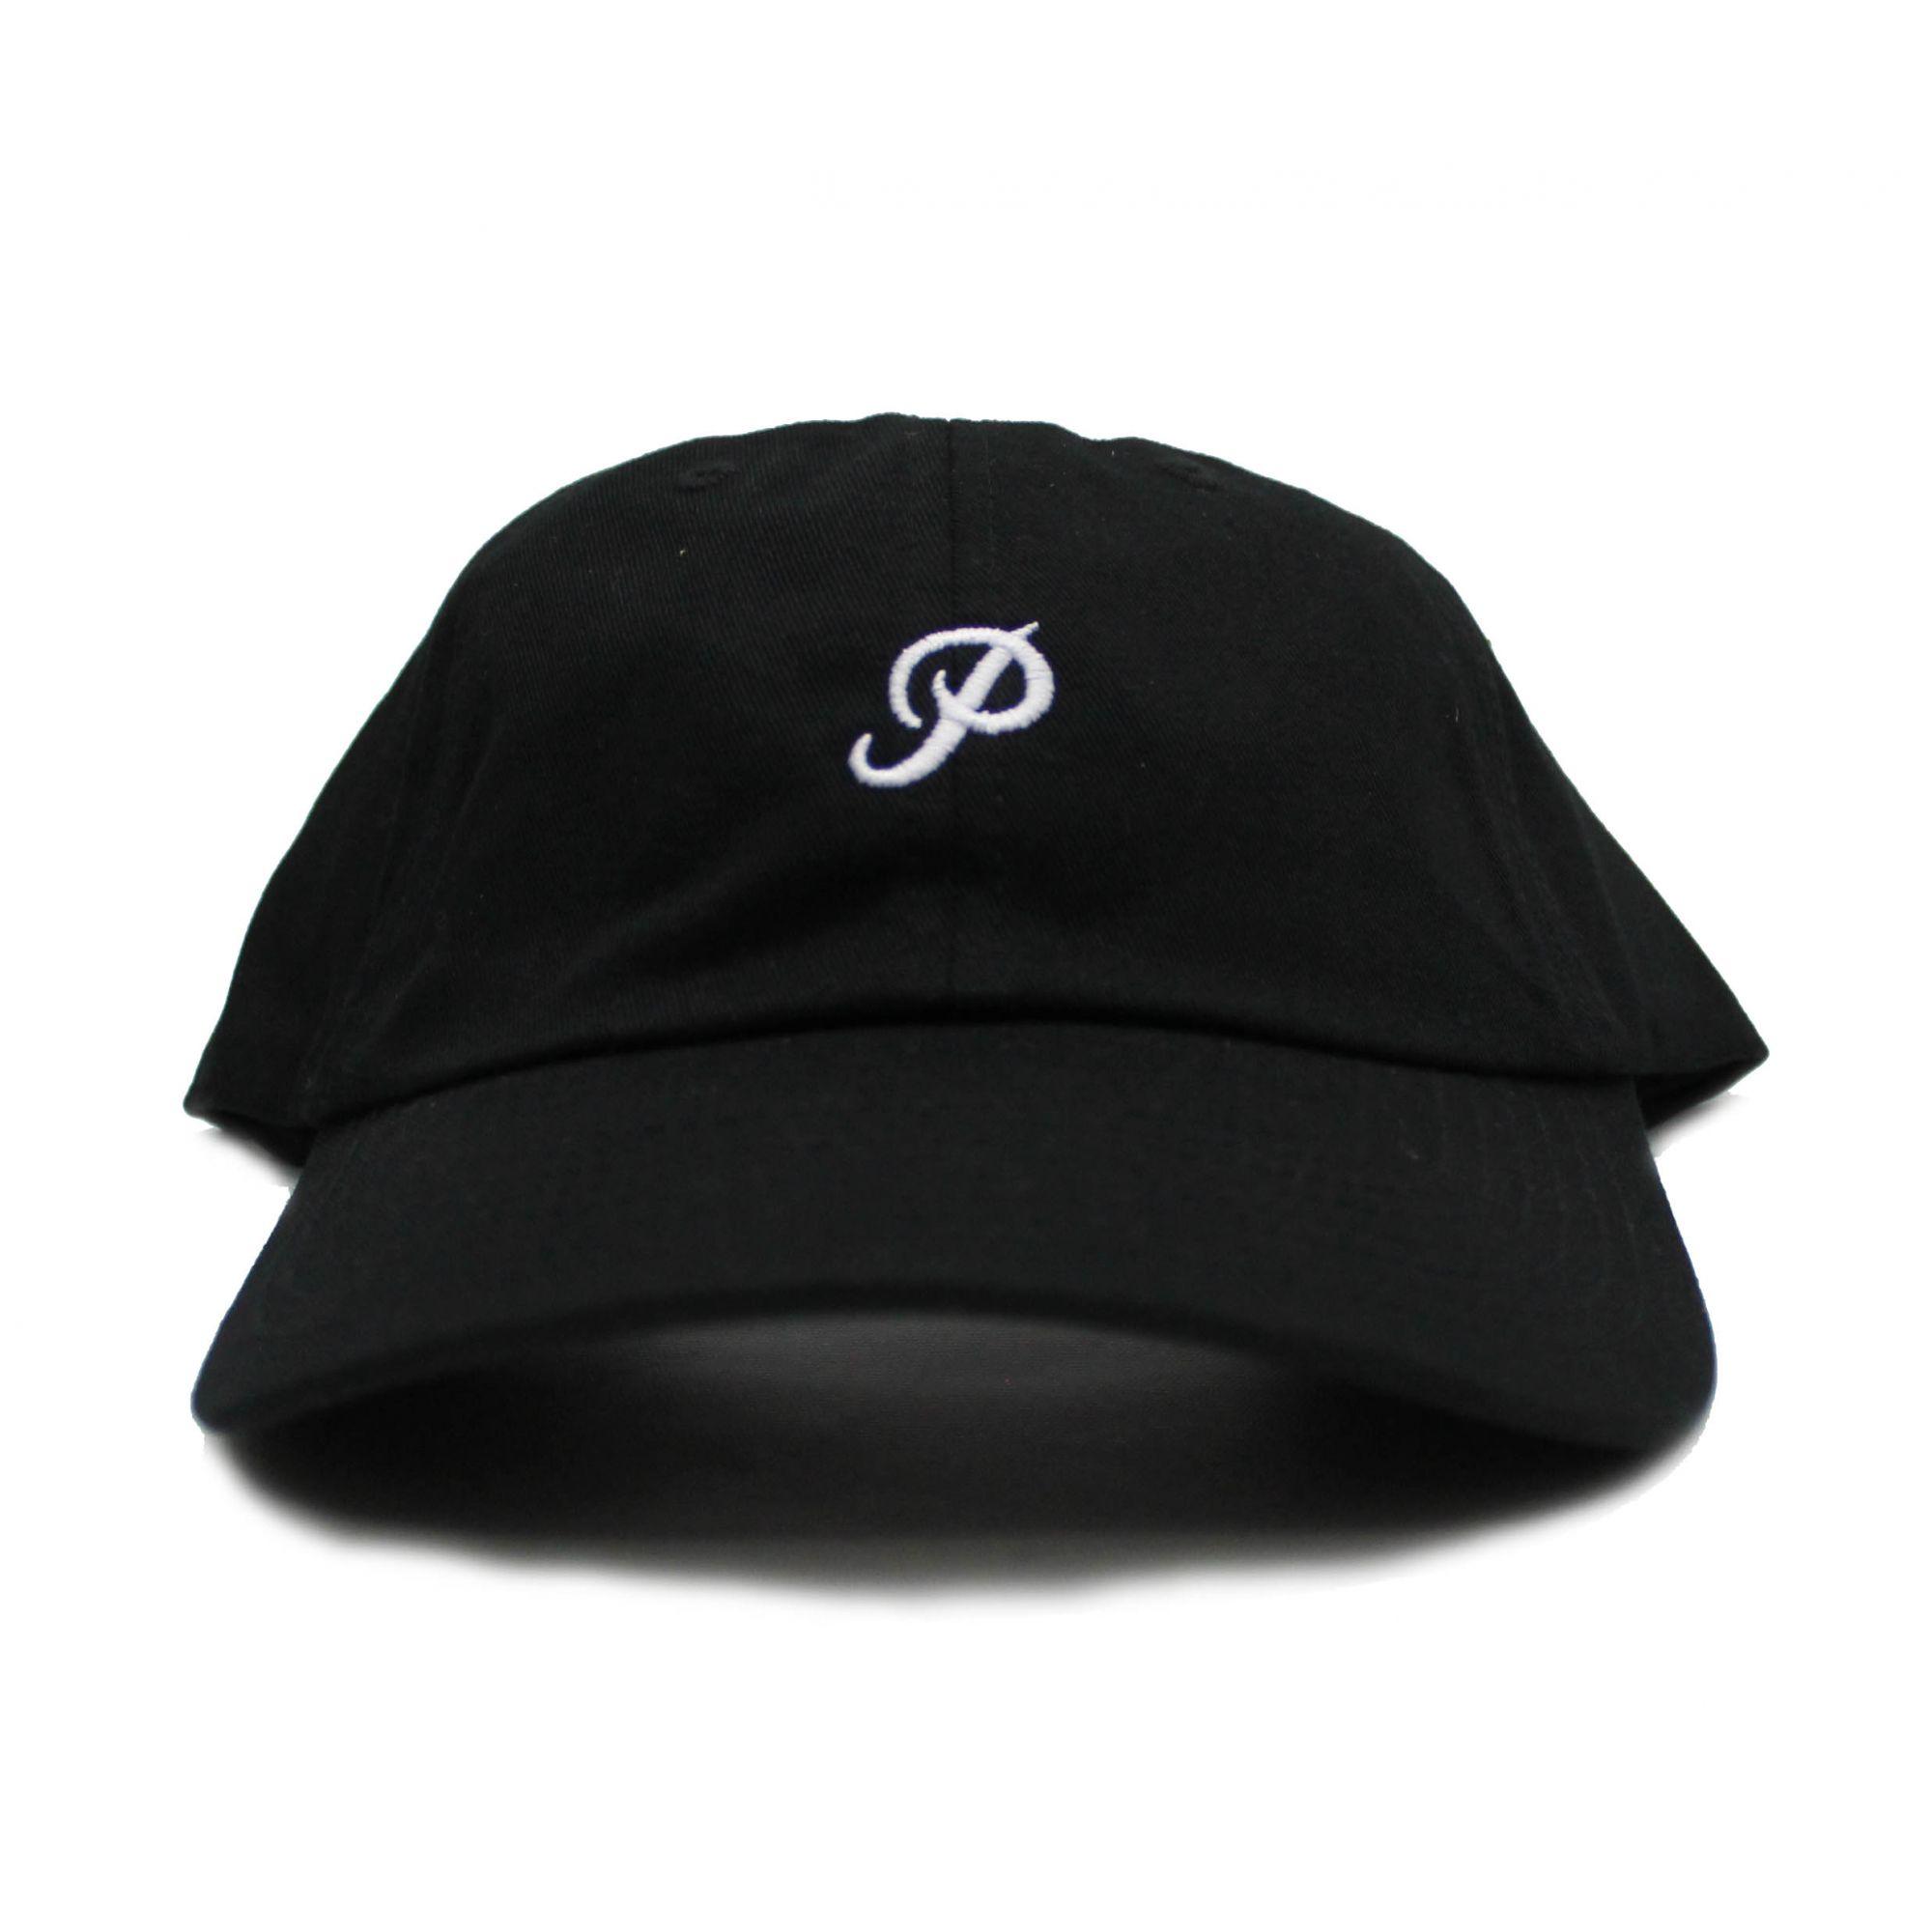 Boné Primitive Dad Hat Classic P - Preto (Importado)